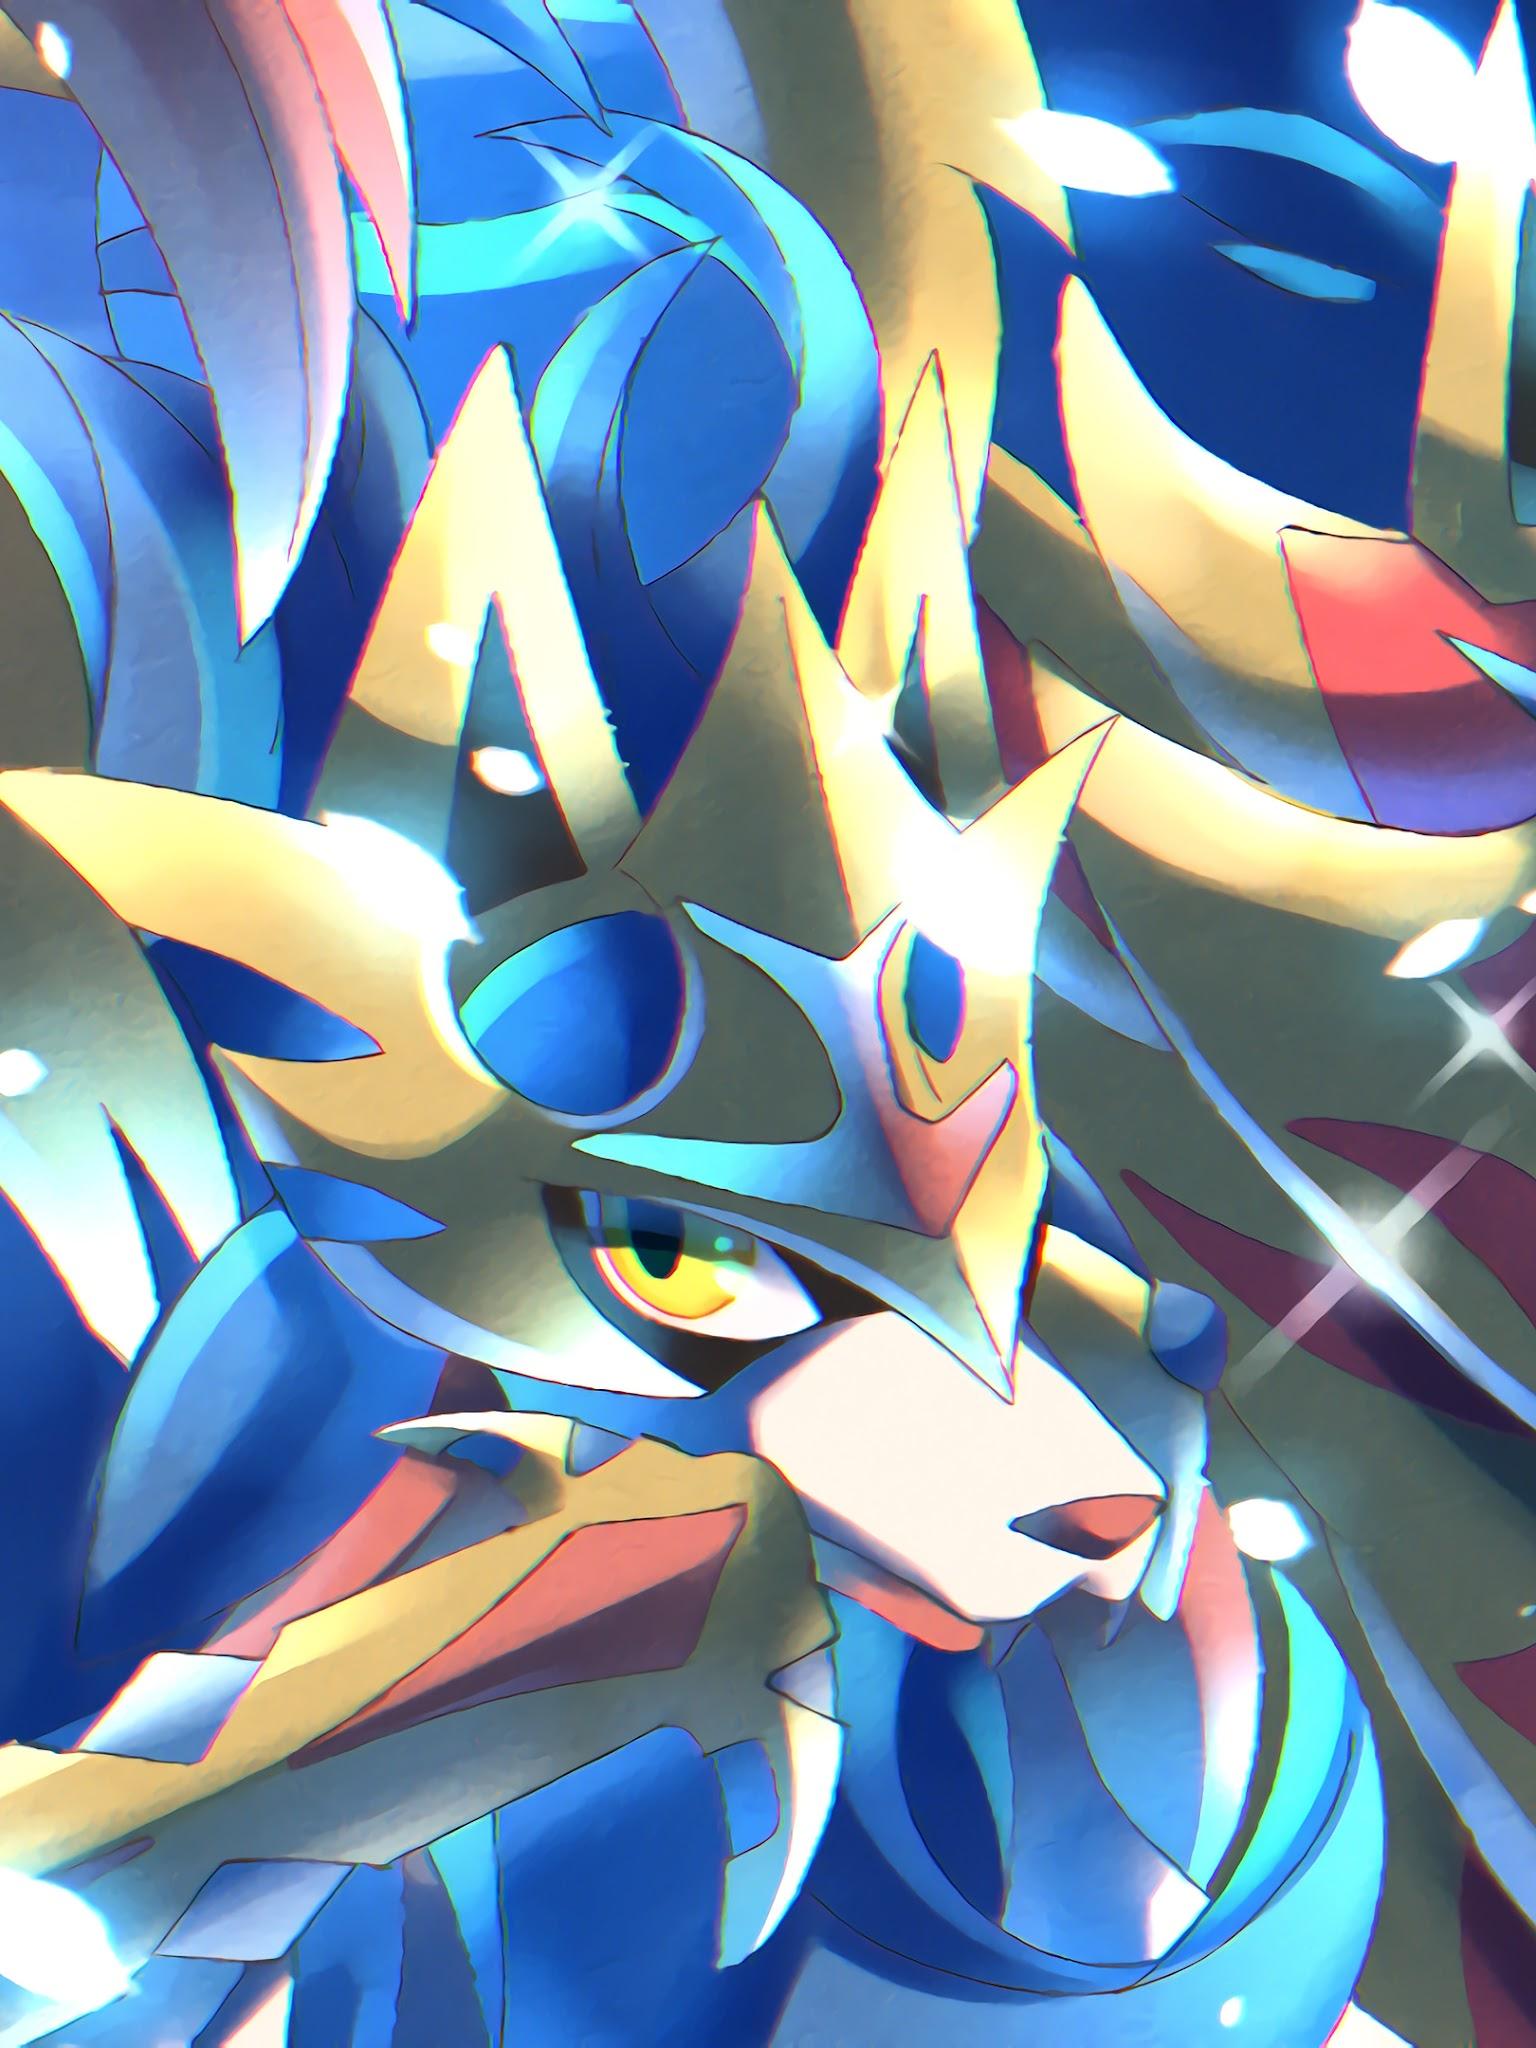 Zacian And Zamazenta Pokemon Sword And Shield 4k Wallpaper 65